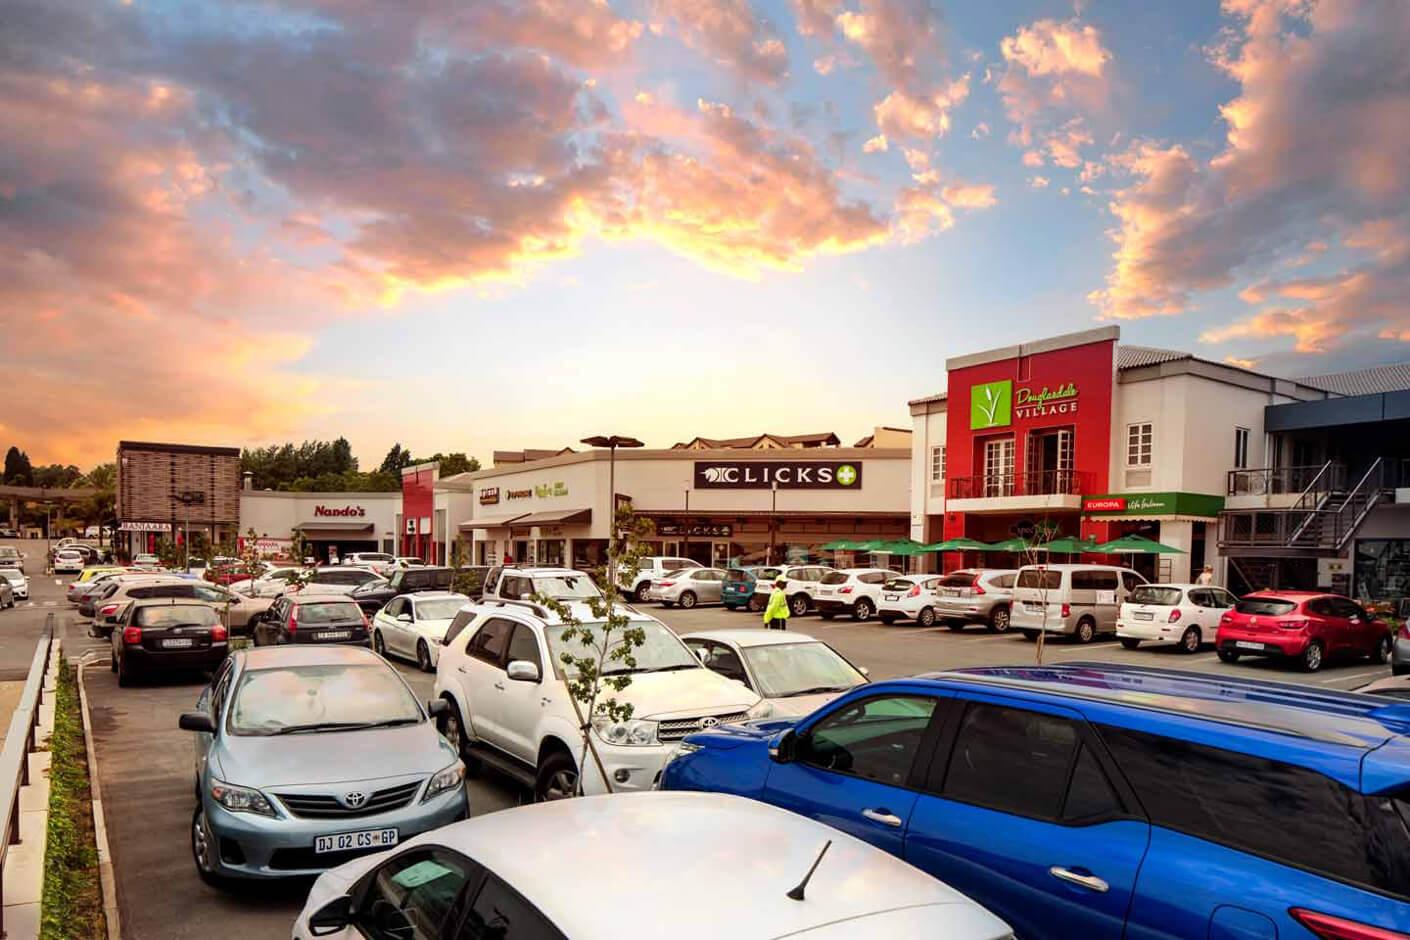 Douglasdale Village building and parking lot in Johannesburg